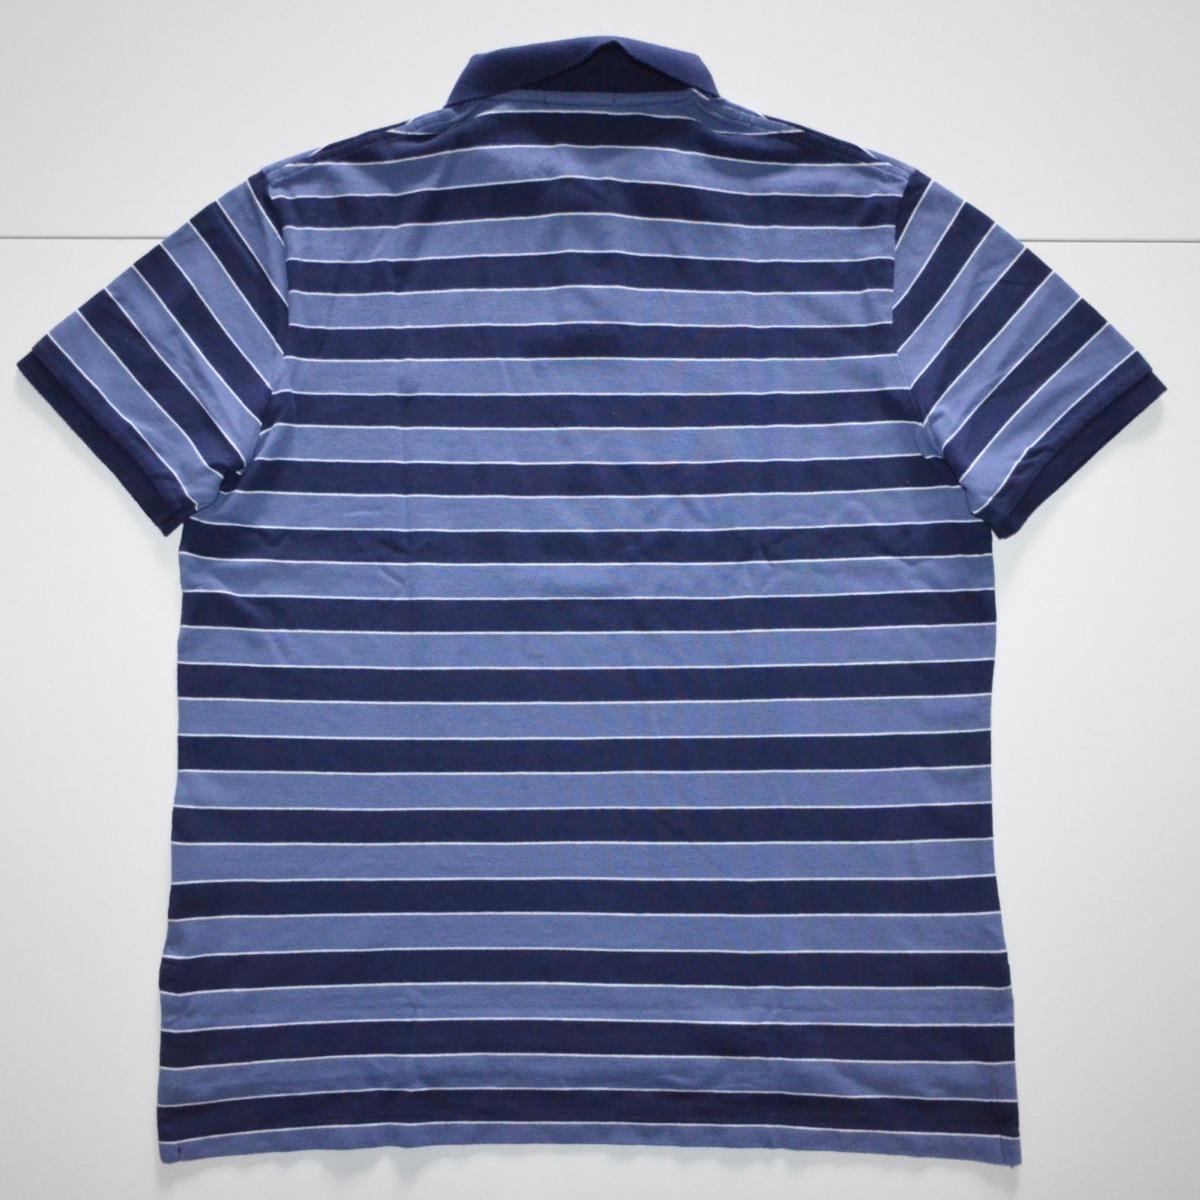 3c0f35ccd2886 Camisa Polo Ralph Lauren Tamanho G   L Original Custom Fit - R  195 ...